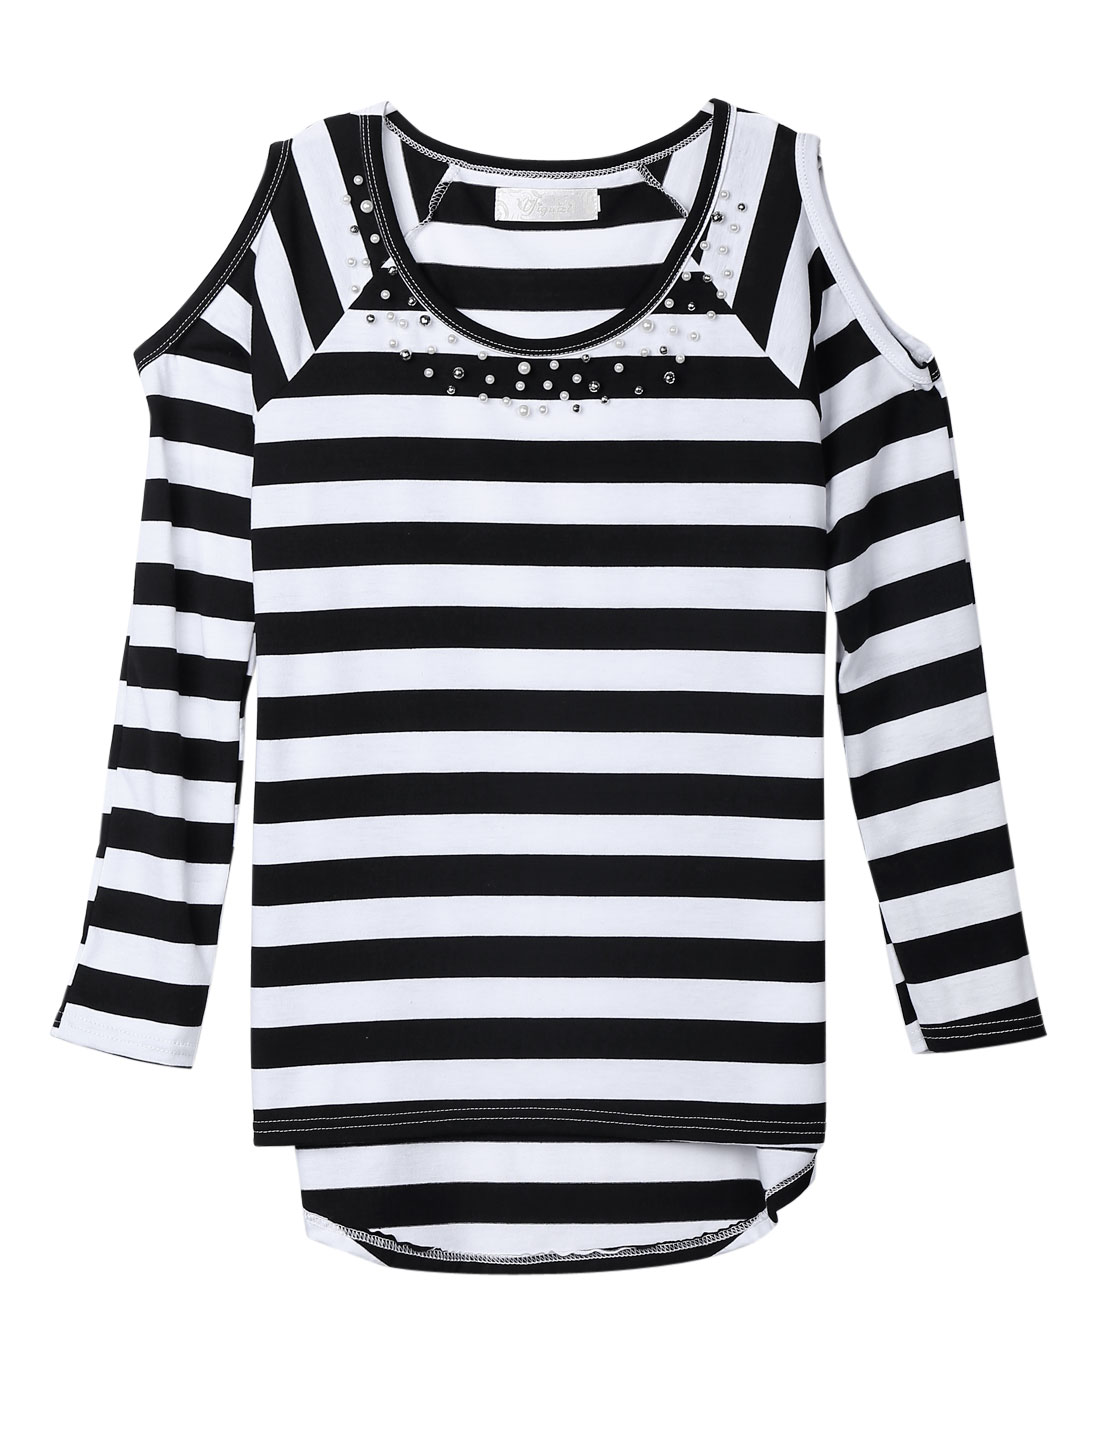 Women Round Neck Stripes Long Sleeves Beaded Neckline Tunic Top Black White XS